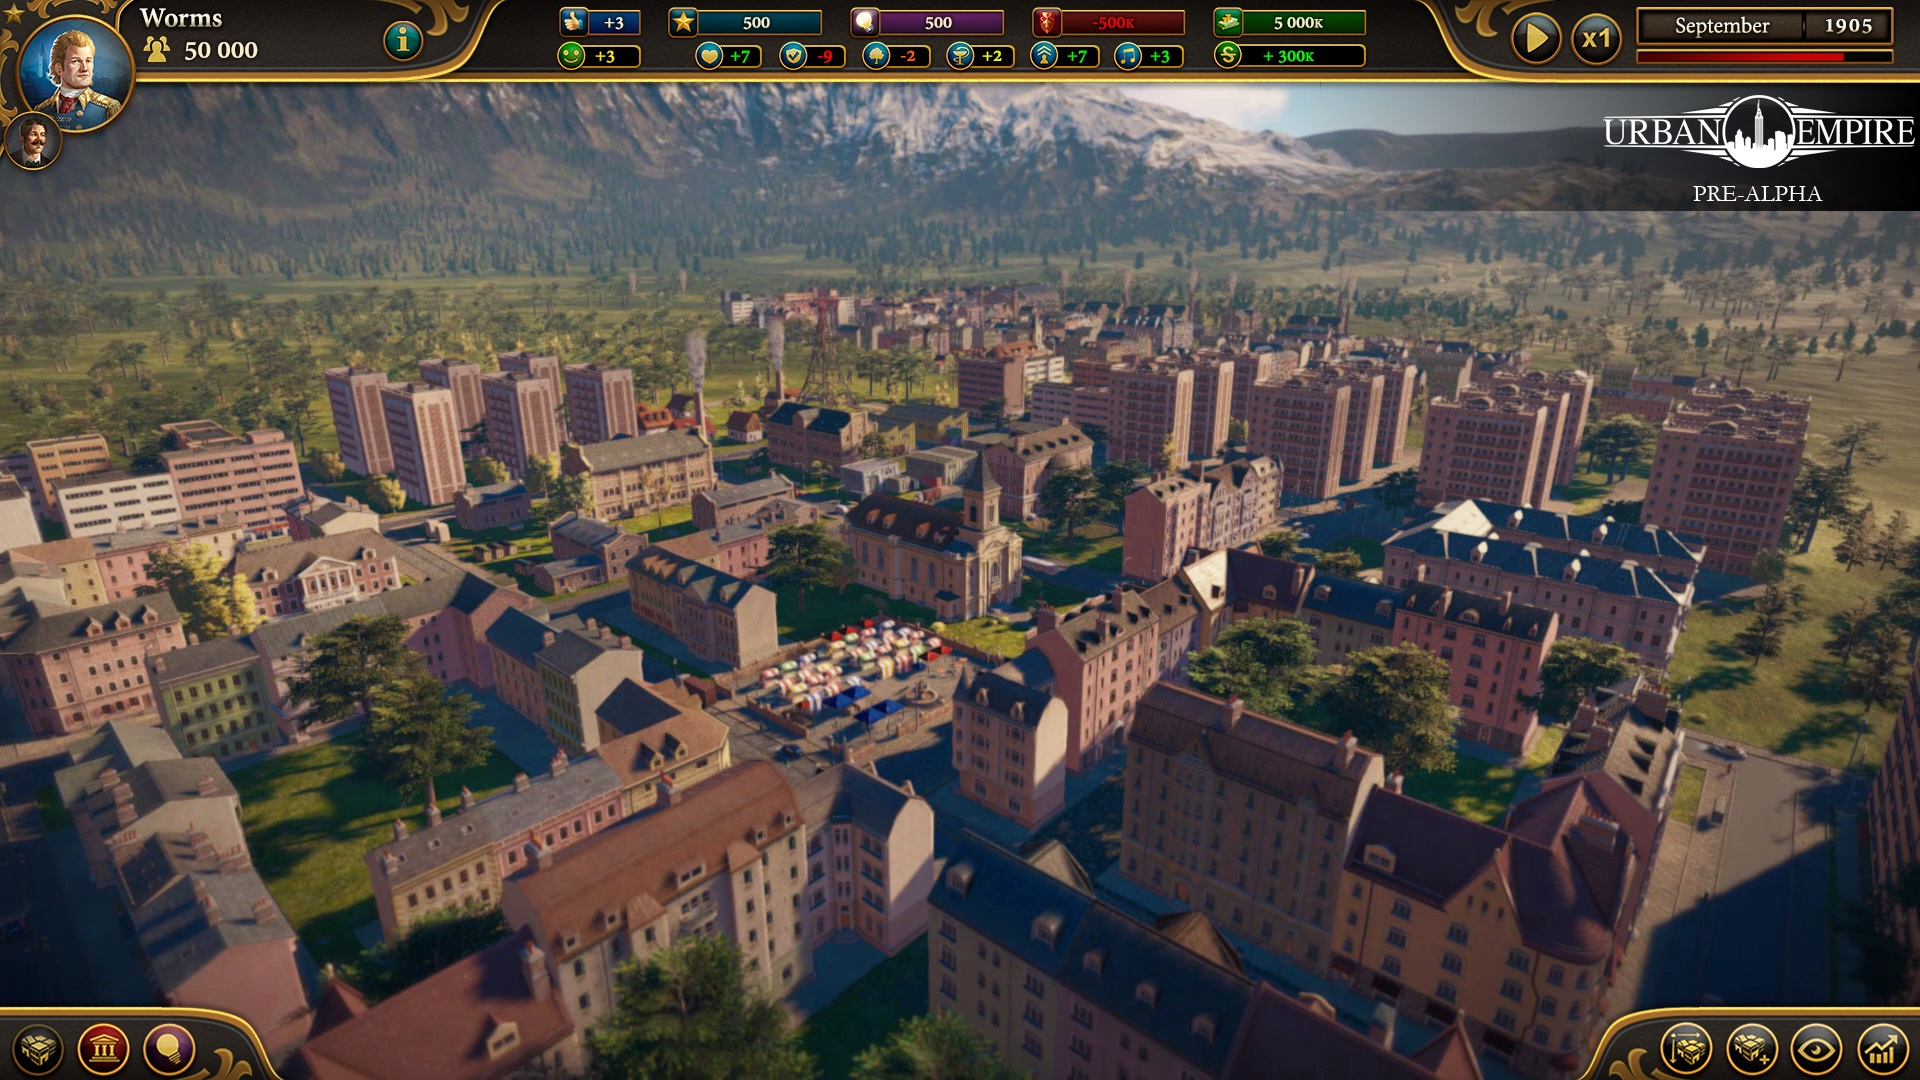 Urban Empire Screenshot 1